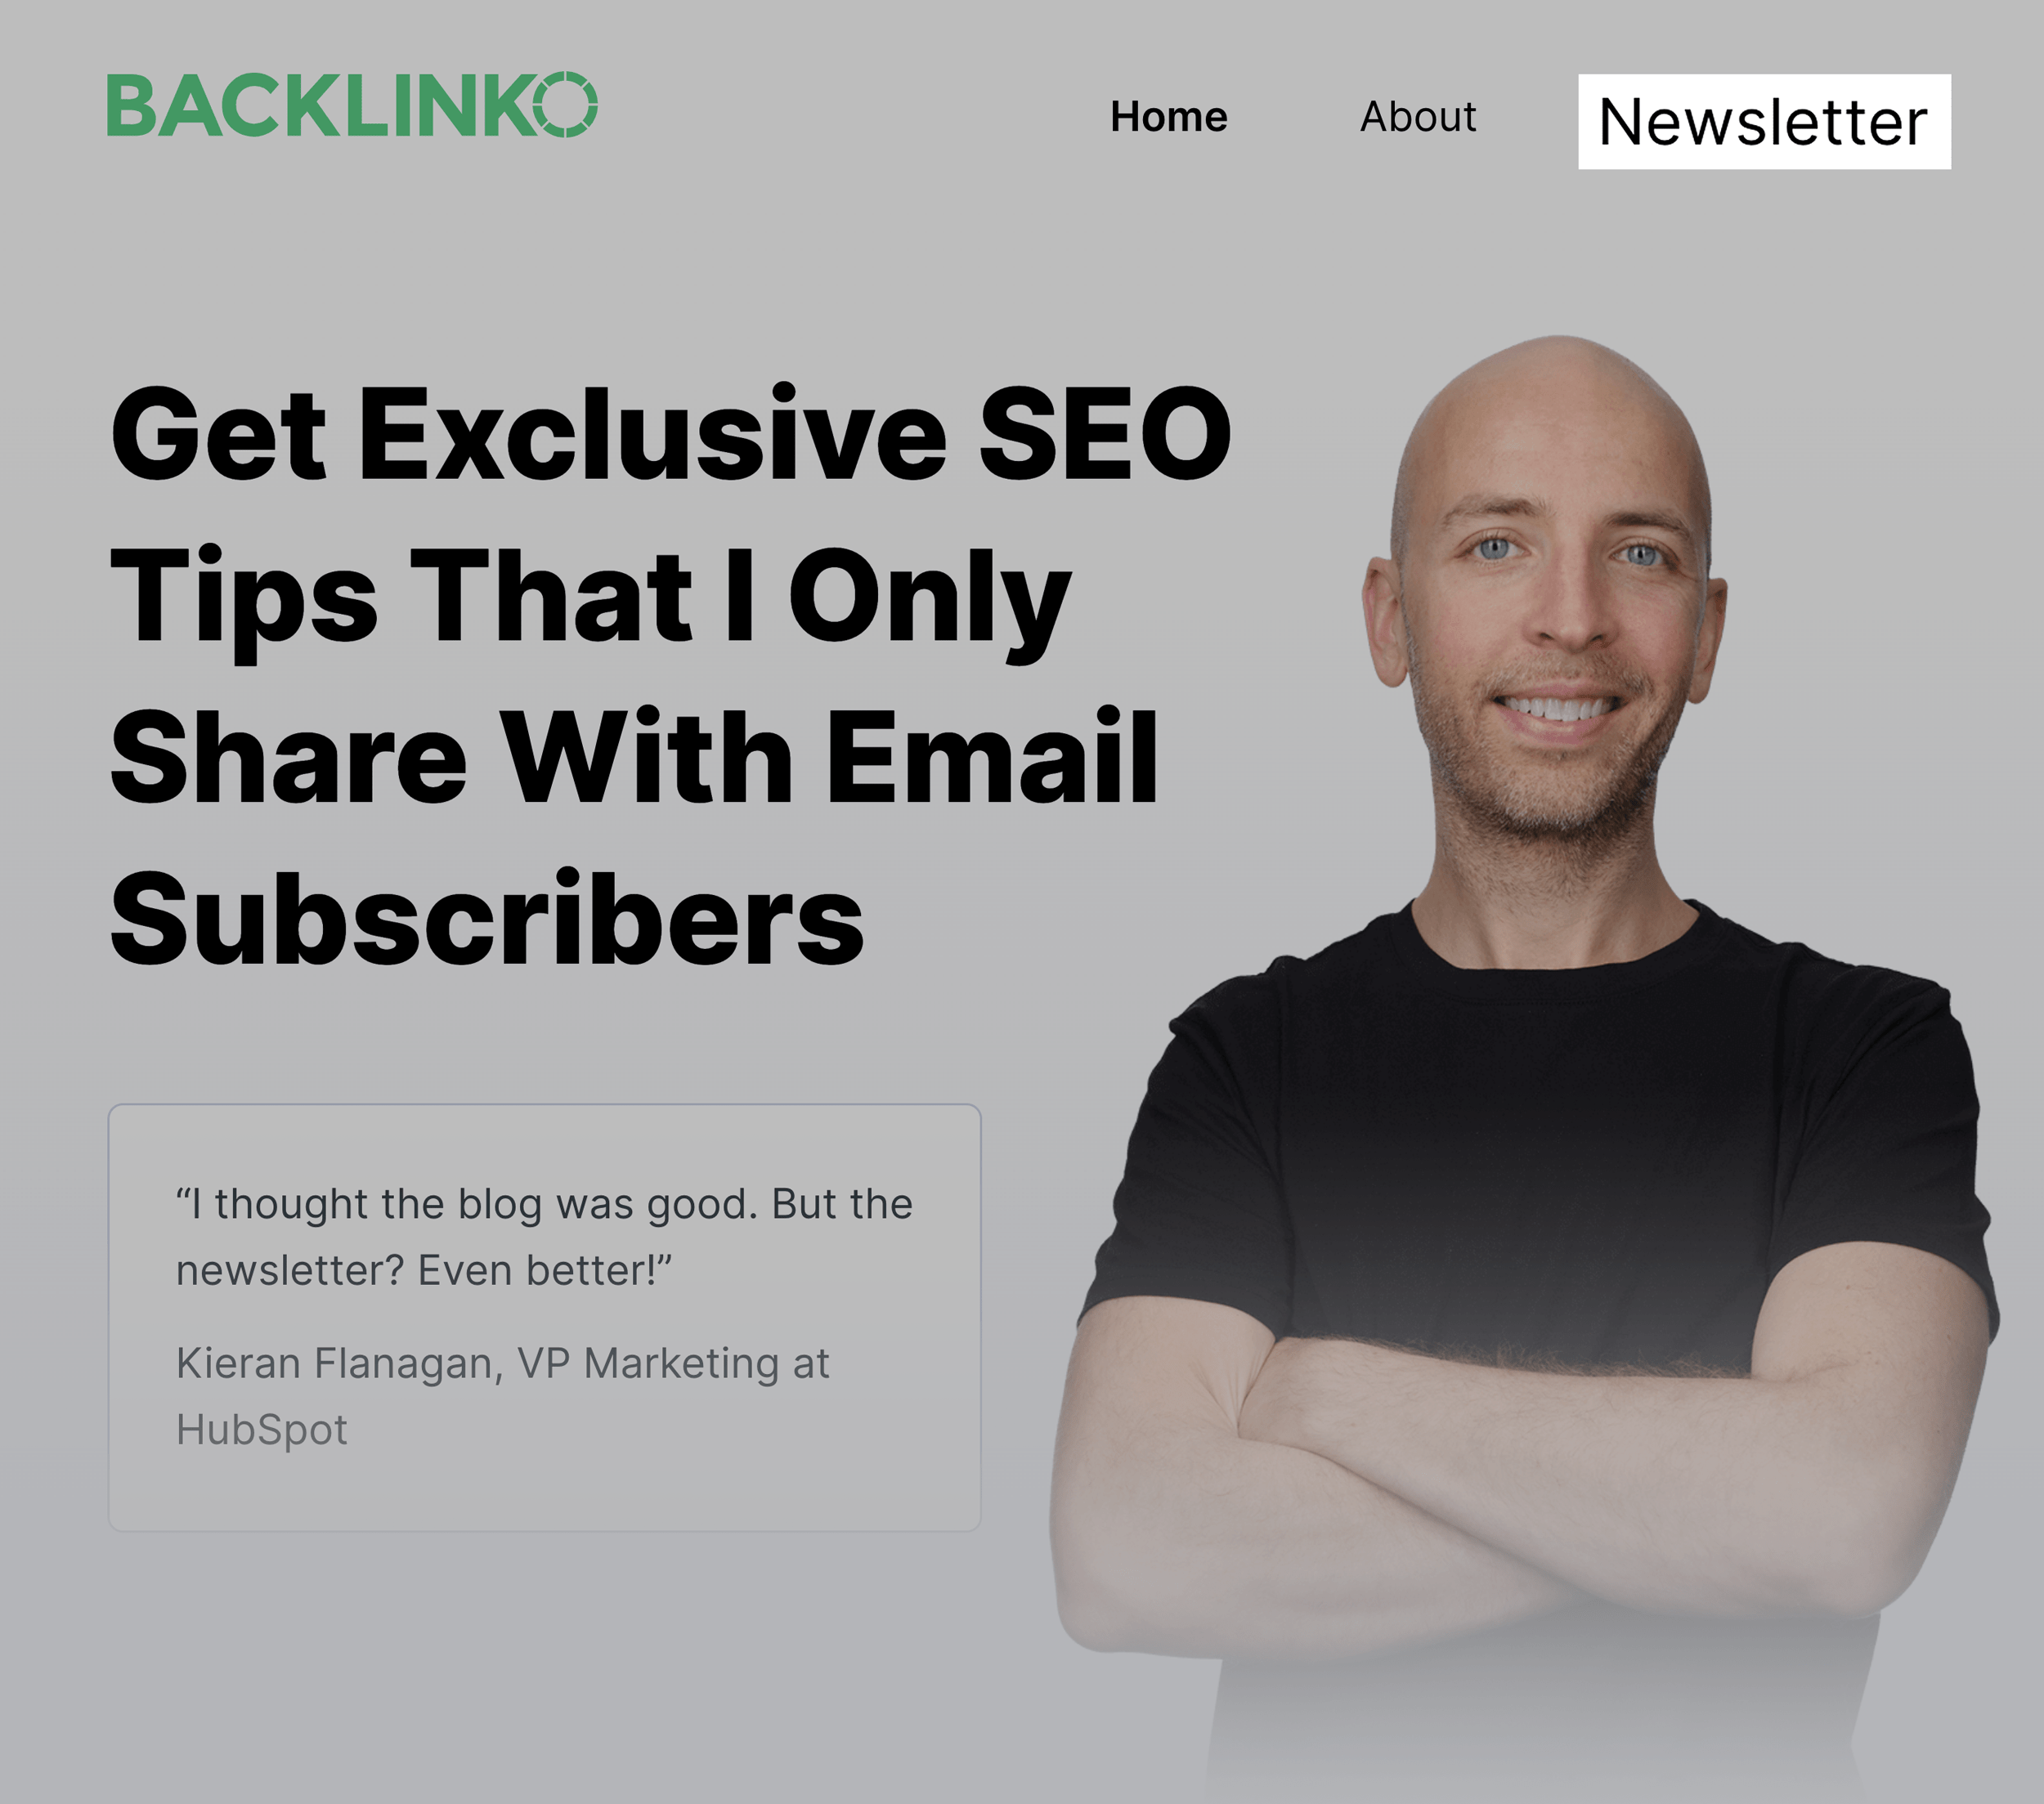 Backlinko – Newsletter Page On-Site Navigation